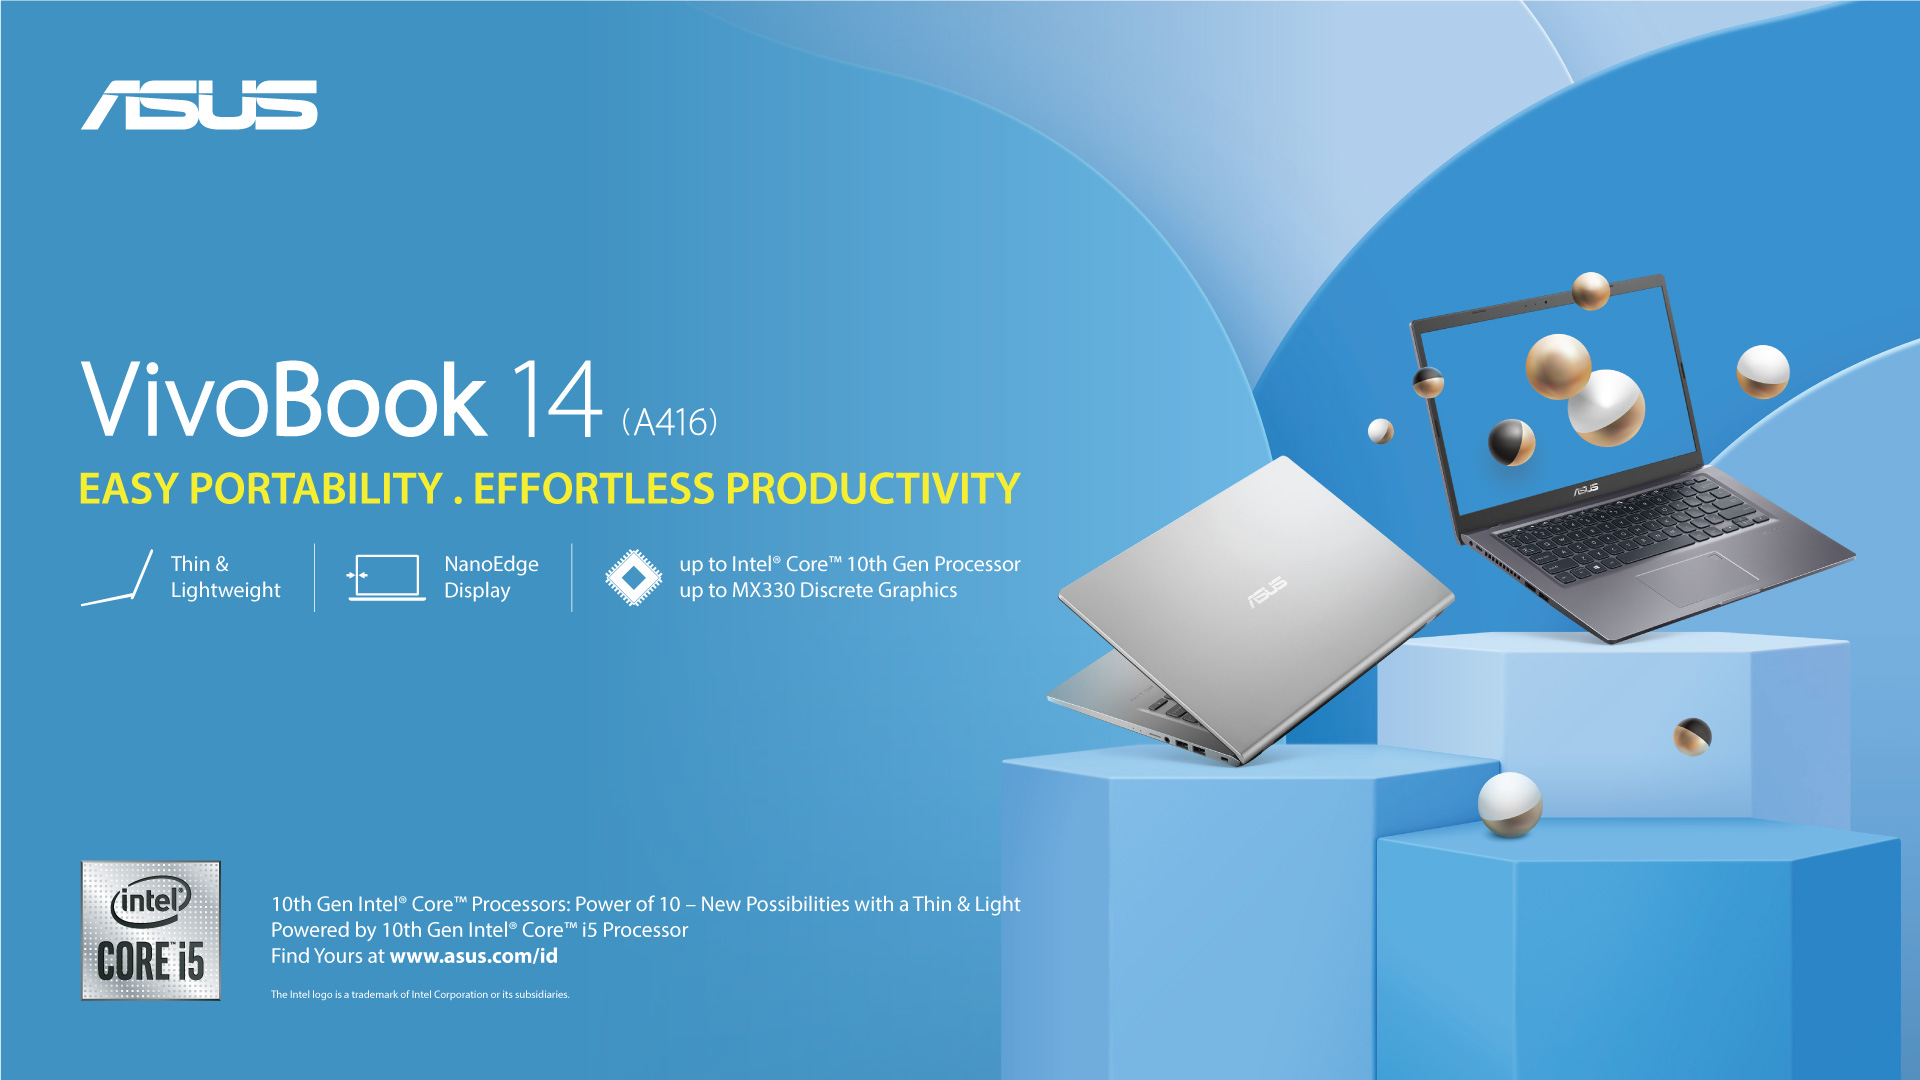 ASUS VivoBook 14 A416,